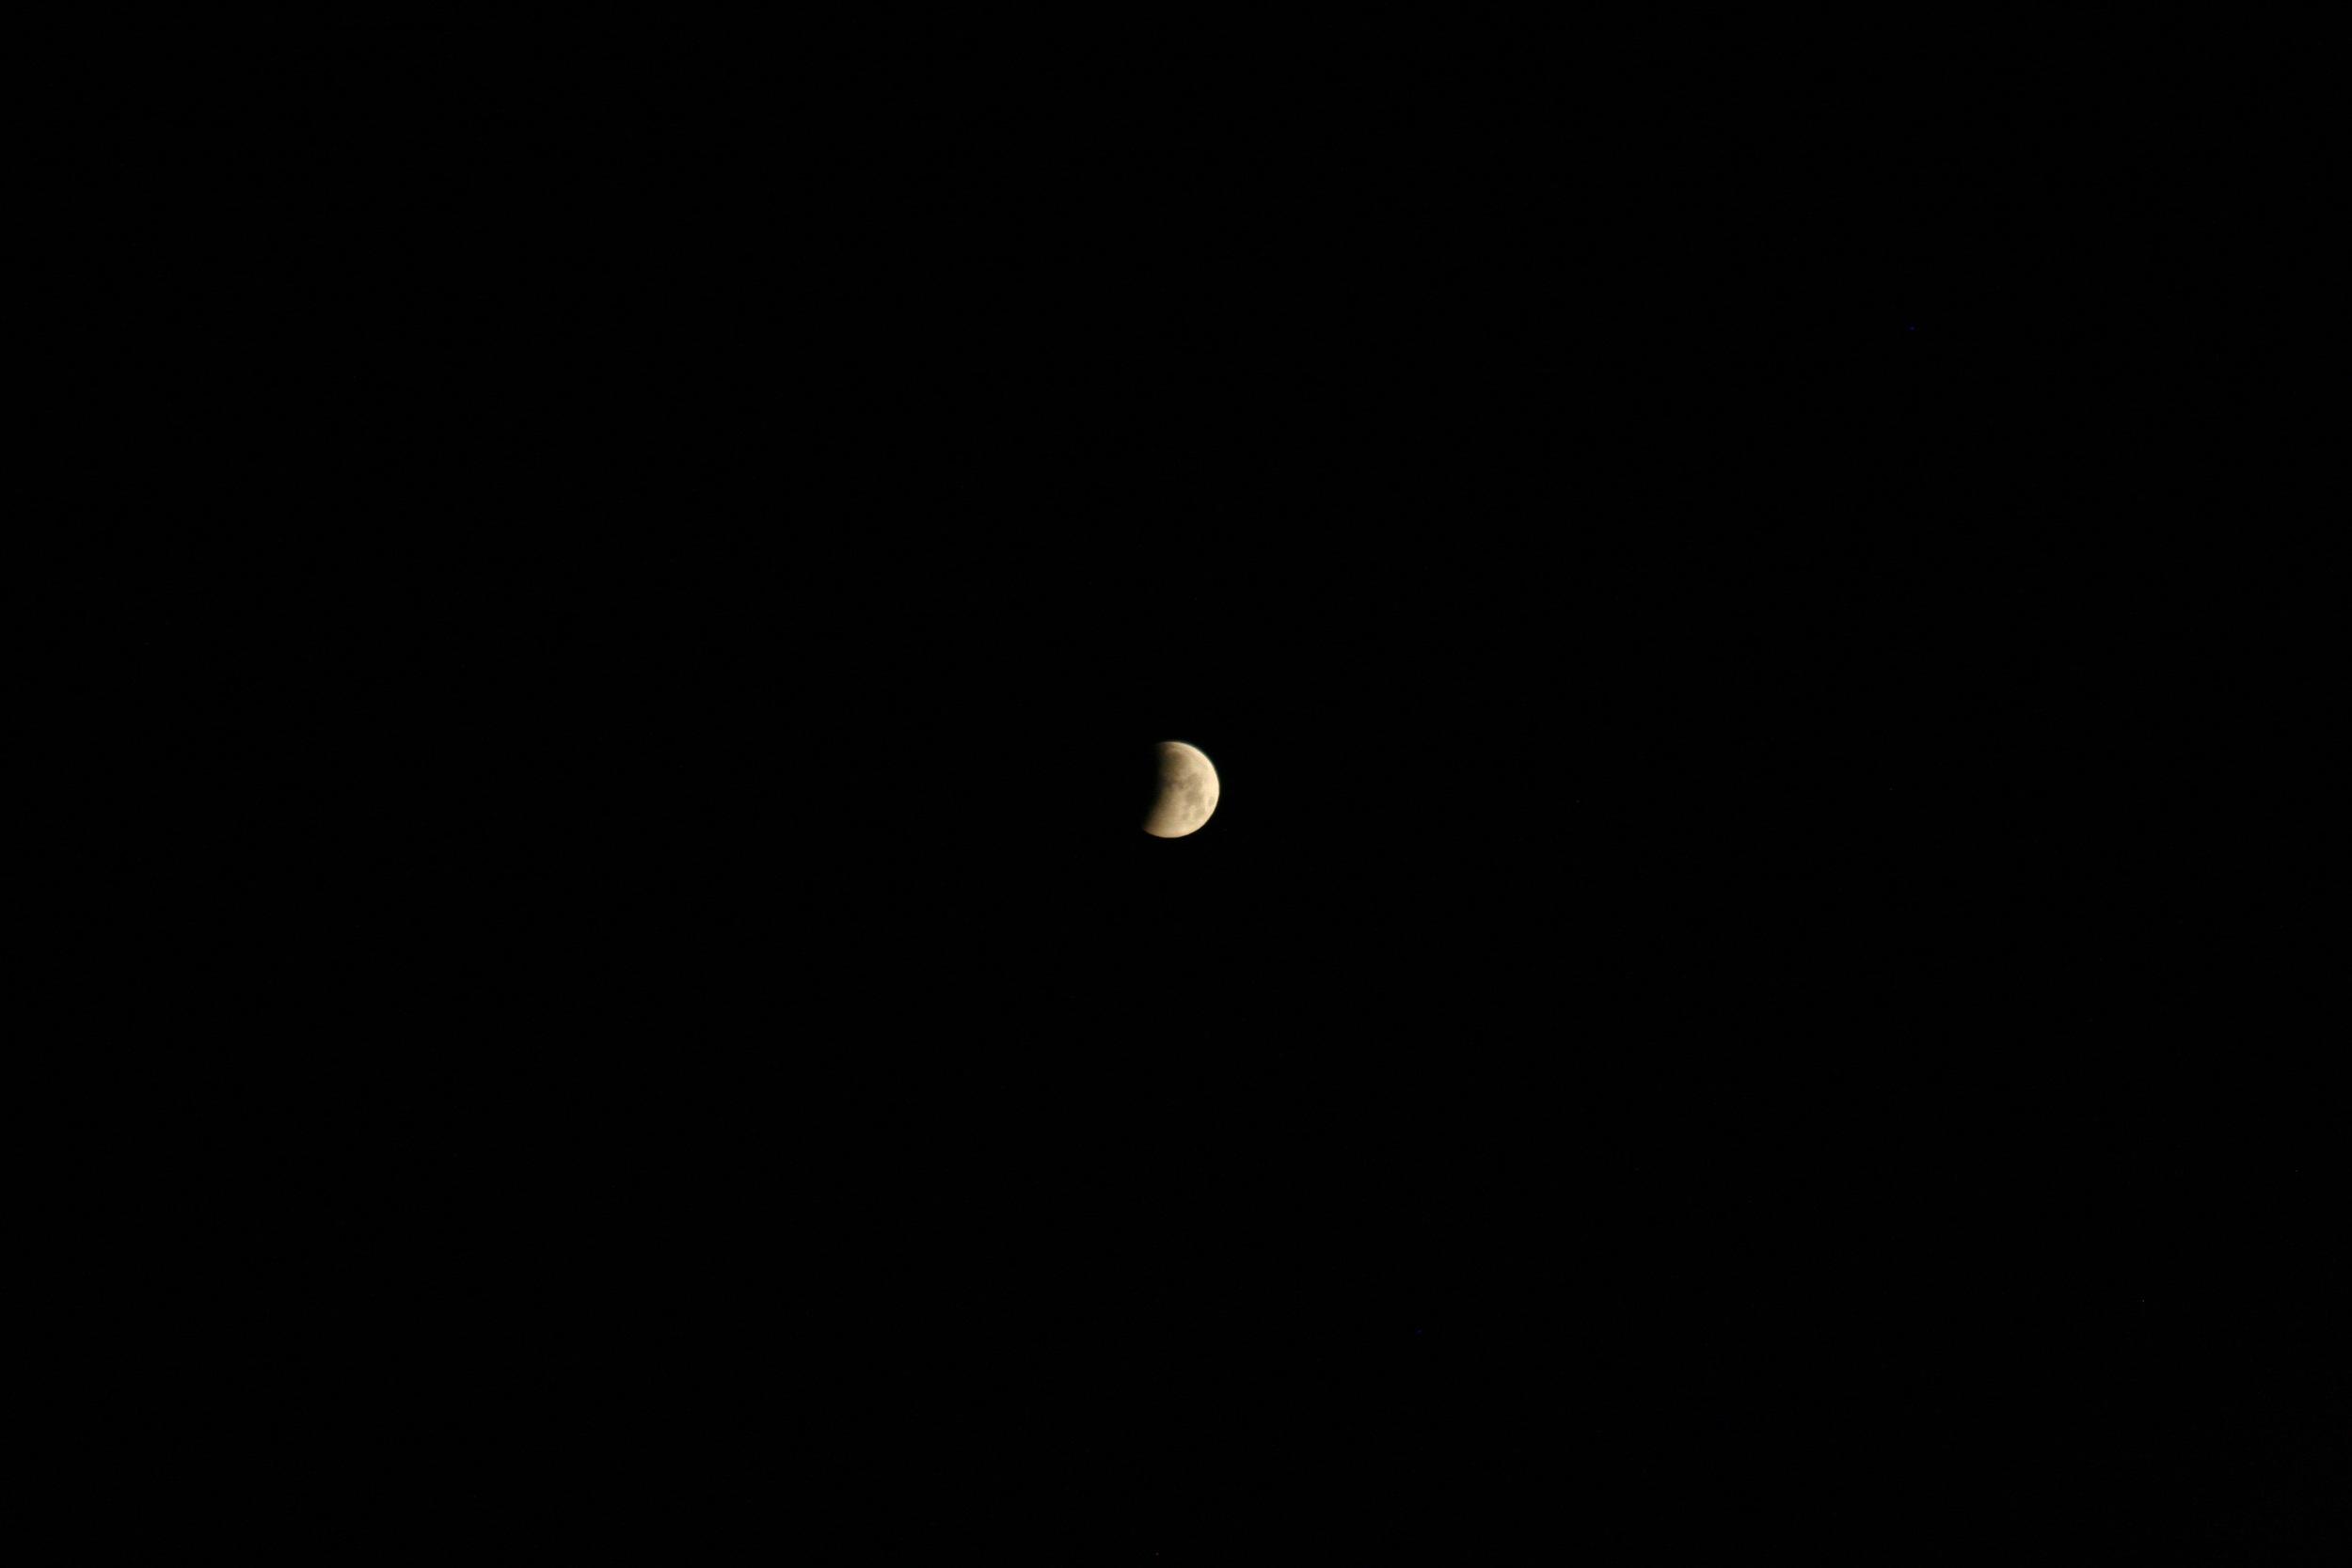 Lunar Eclipse April 20151.jpg